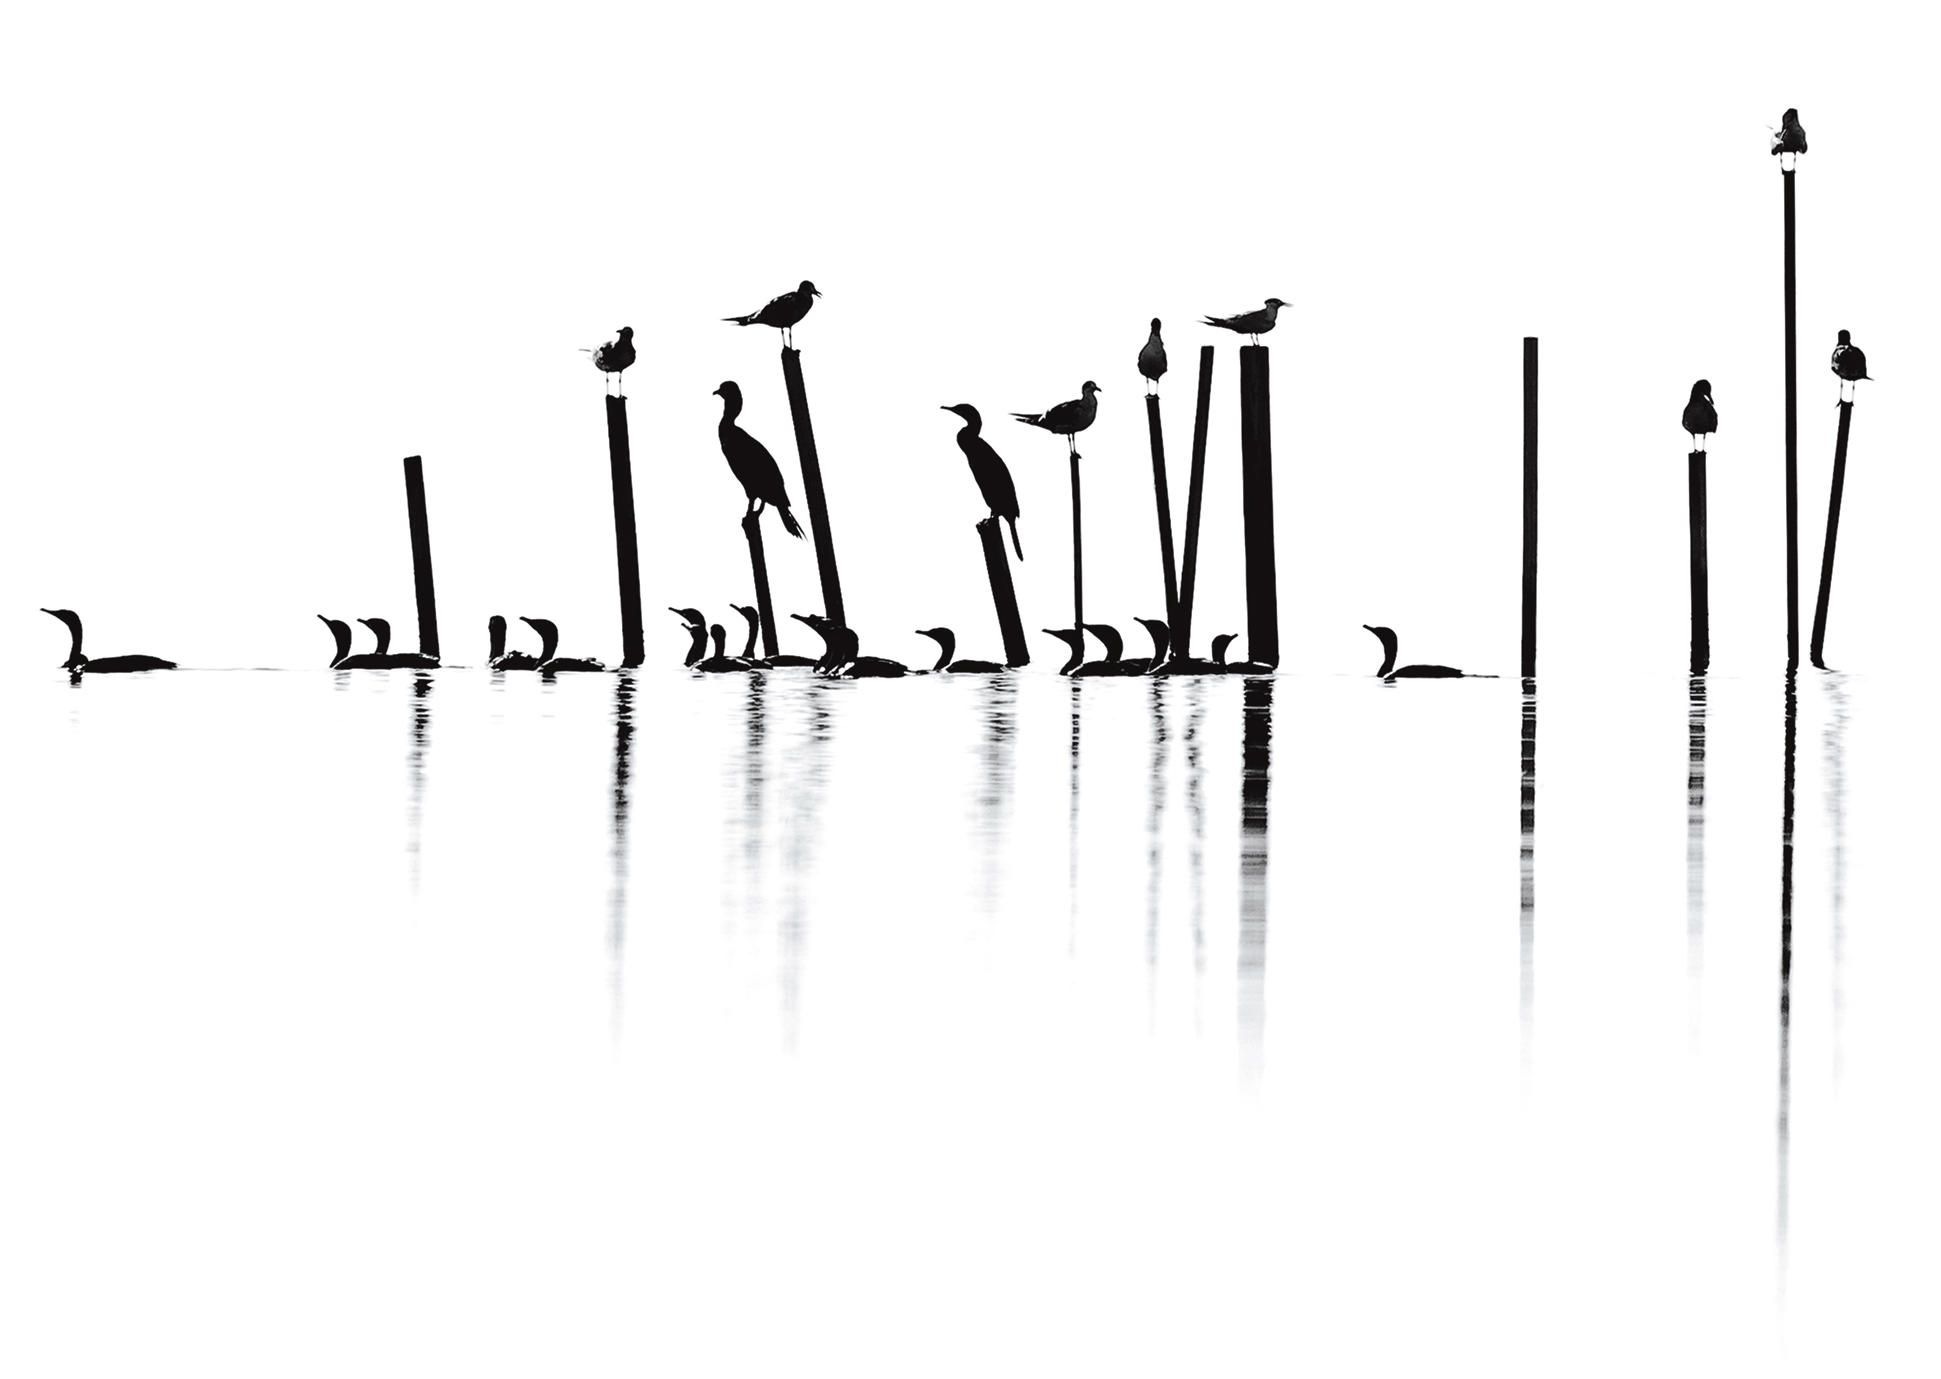 https://www.audubon.org/magazine/may-june-2015/announcing-2015-audubon-photography-awards?utm_source=engagement